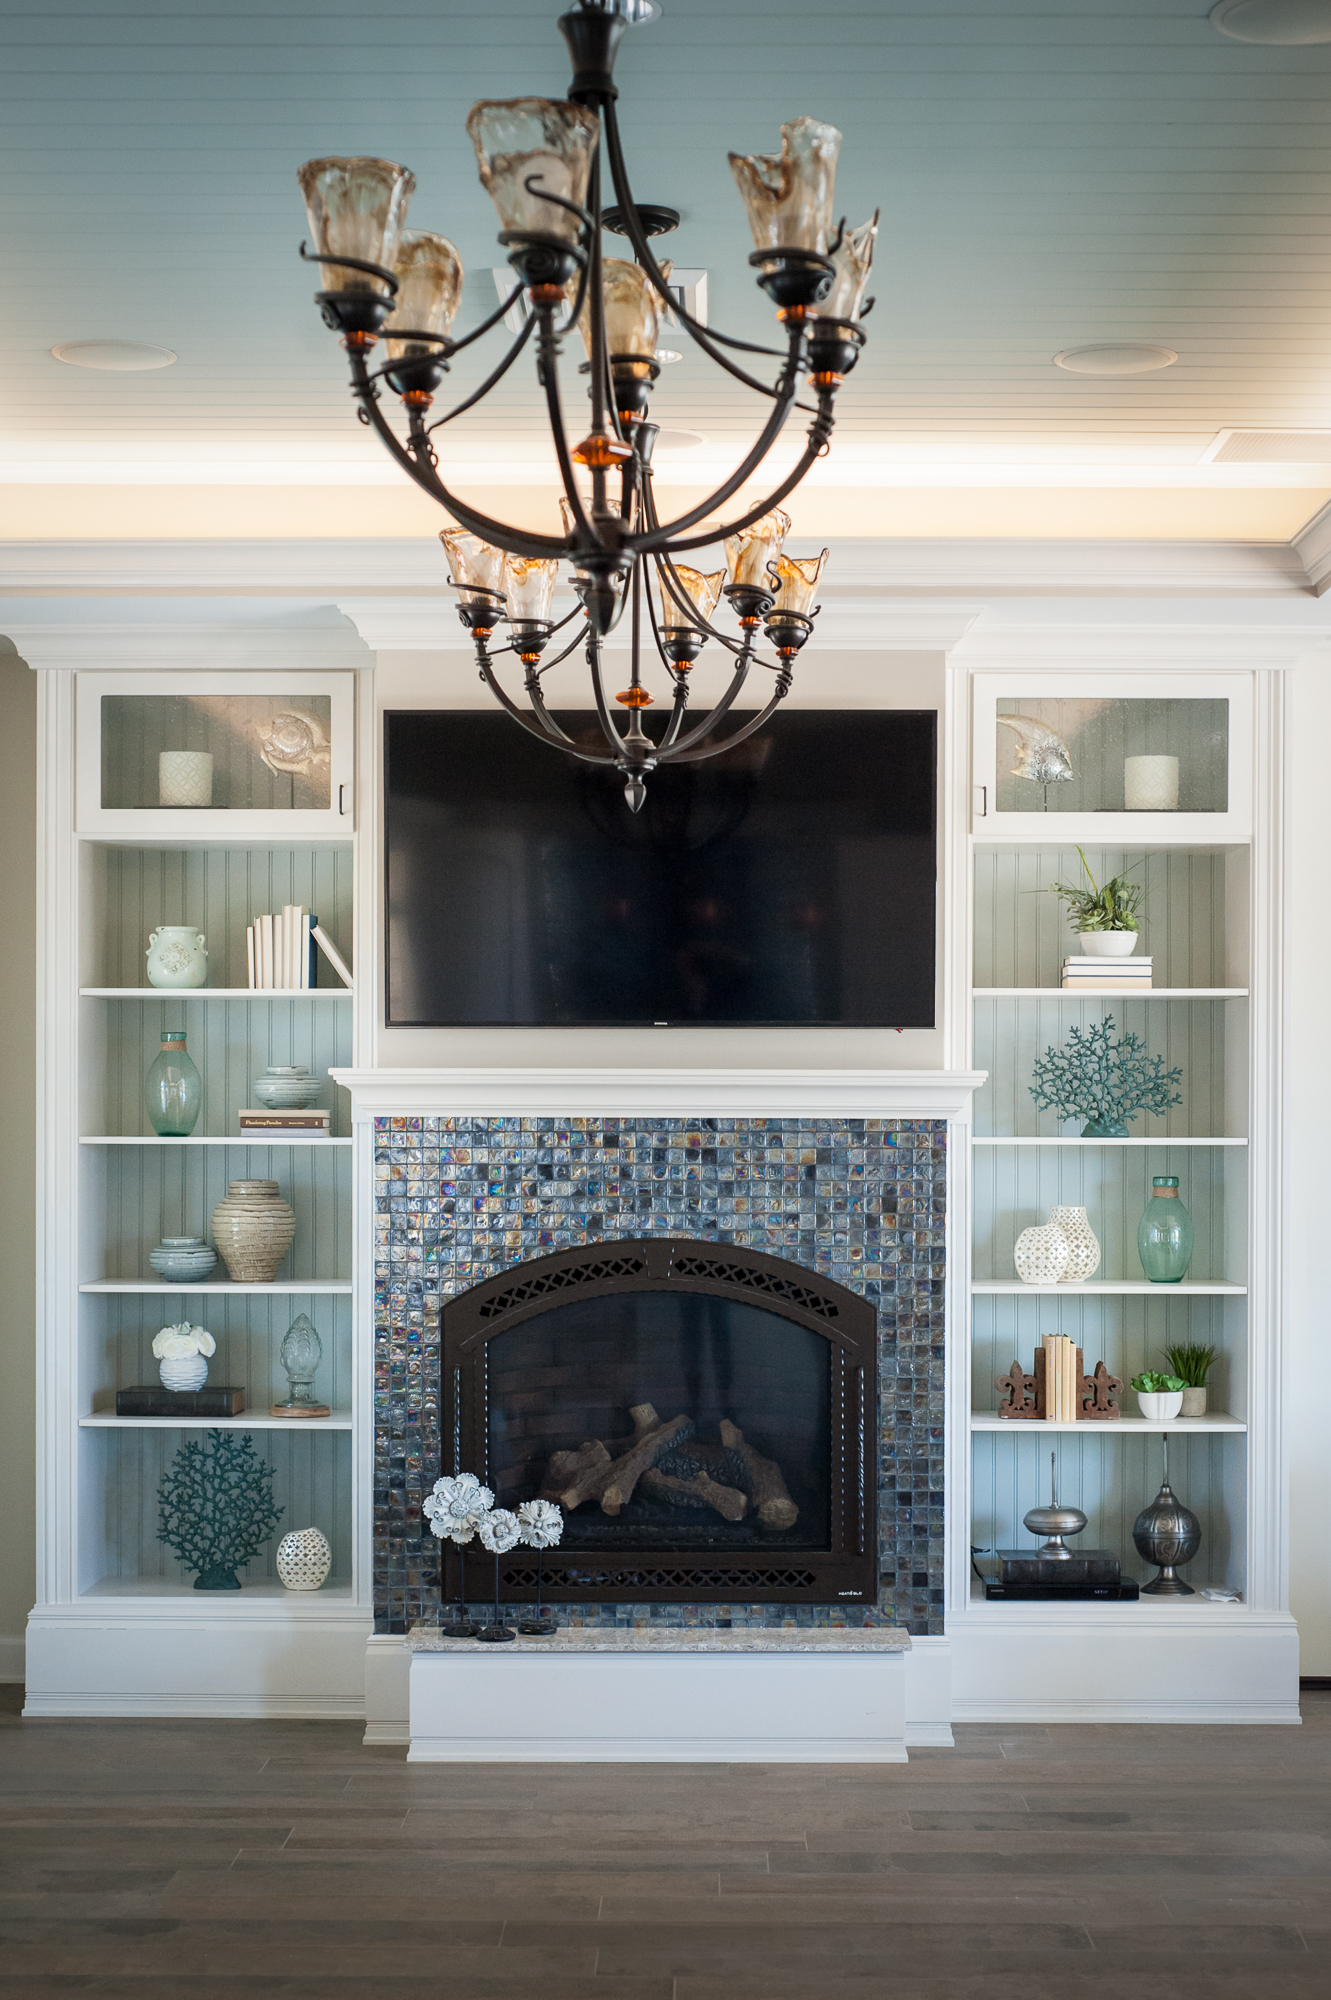 Micamy_Design_Studio_Interior_Design_Artisan_Lakes_Clubhouse_Serene_Coastal_Glass_Mosaic_Tile_Backsplash_Fireplace_SherwinWilliams_Crossville_Blue_ (2).jpg